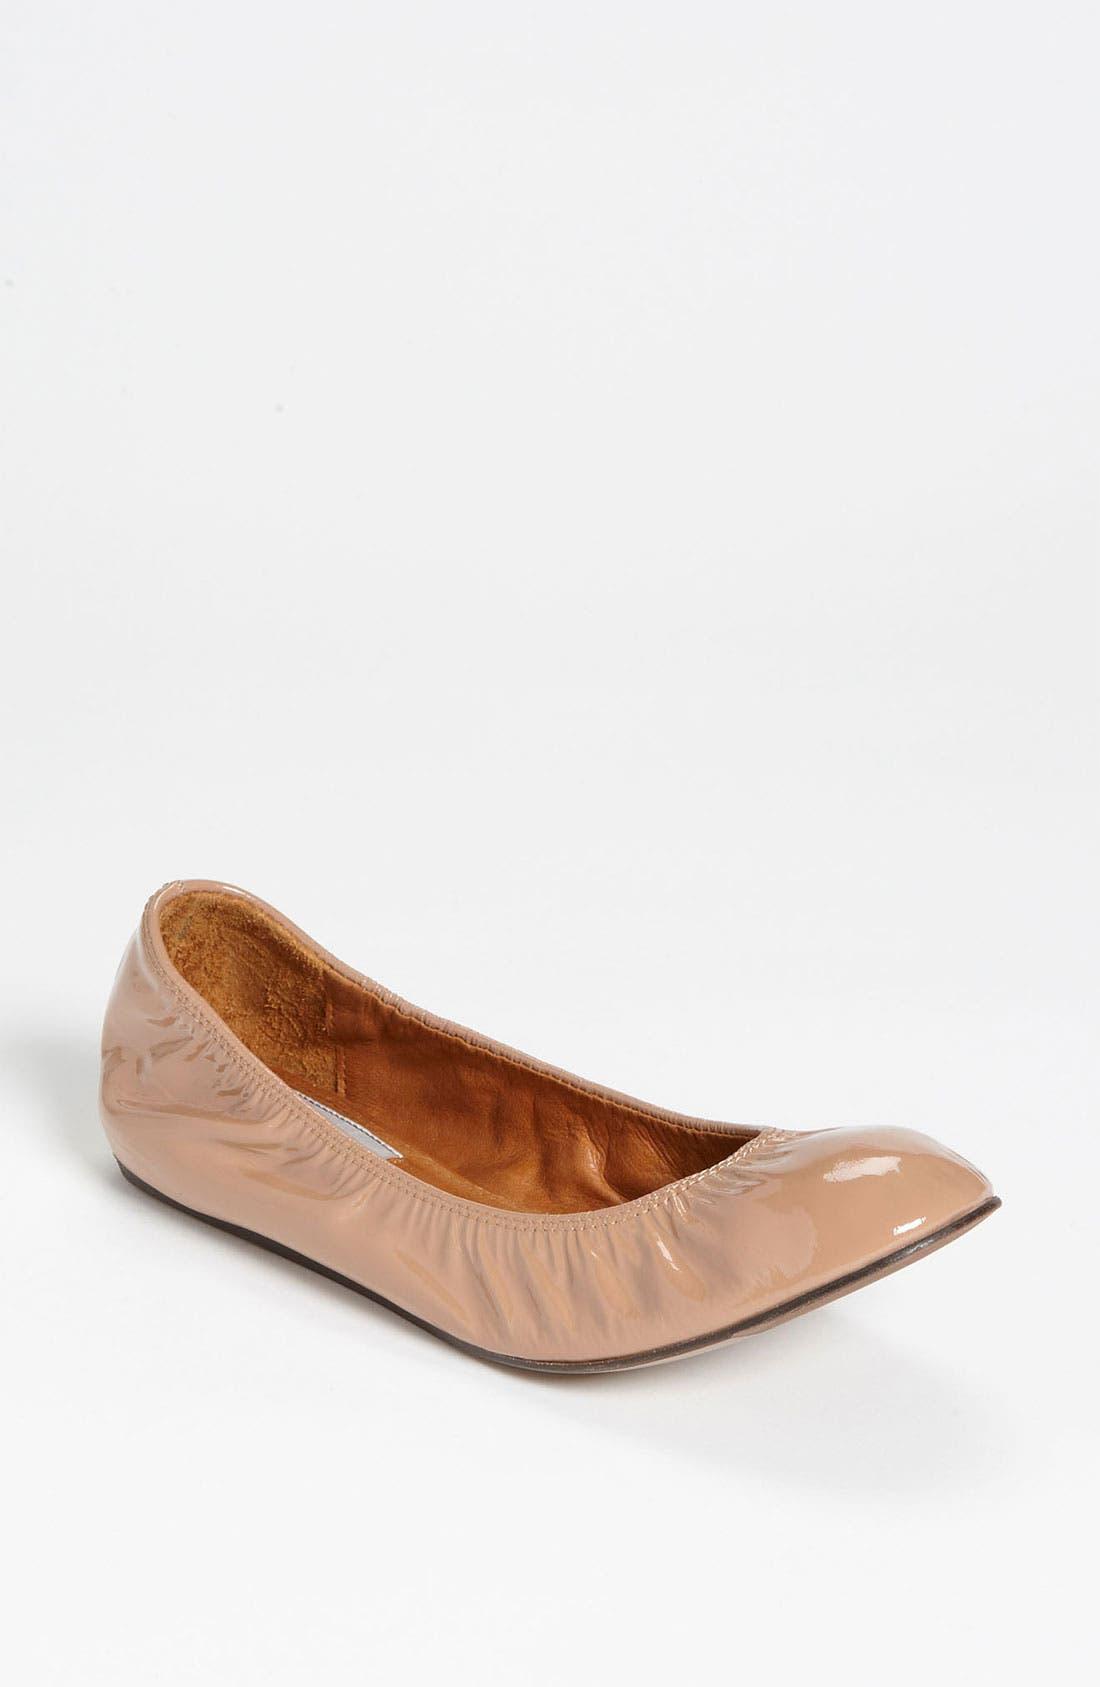 Alternate Image 1 Selected - Lanvin Patent Ballerina Flat